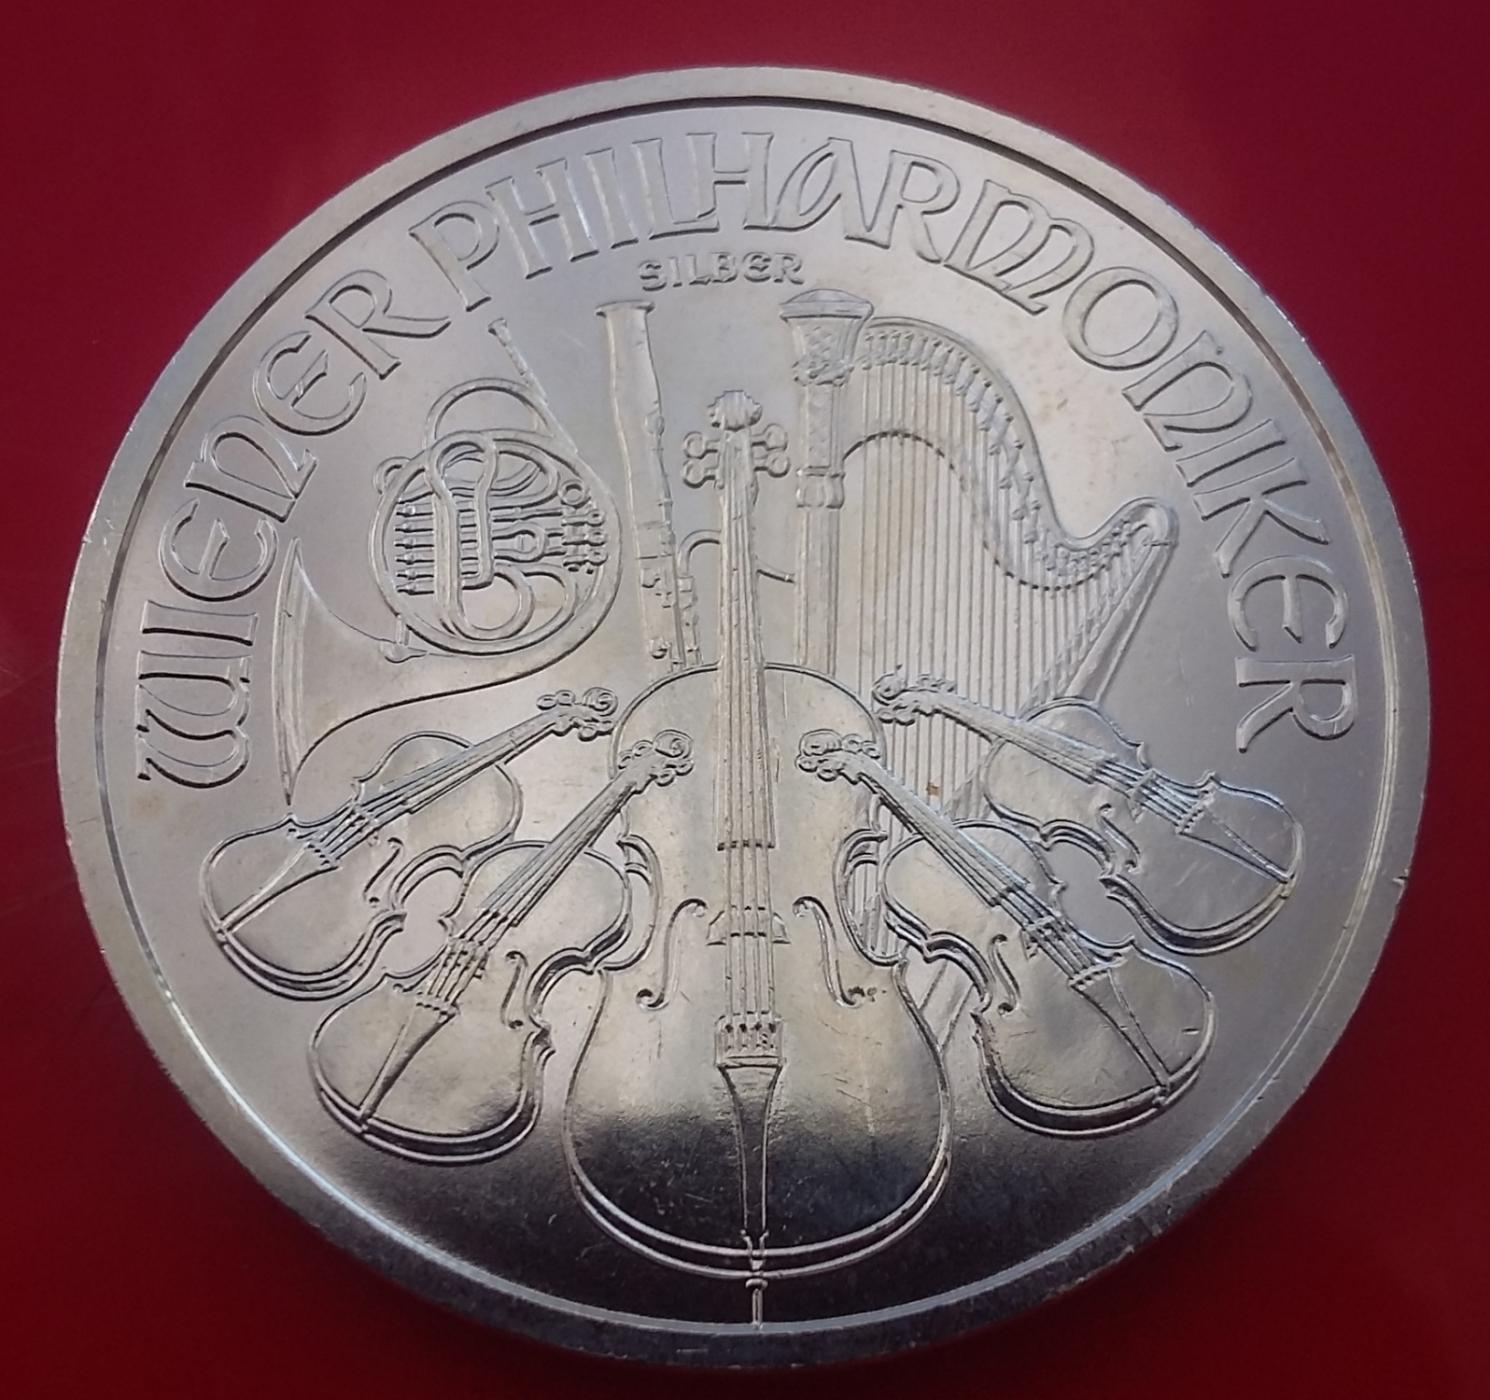 1,50 Euro 2013 - Vienna Philharmonic, Commemorative - 1999